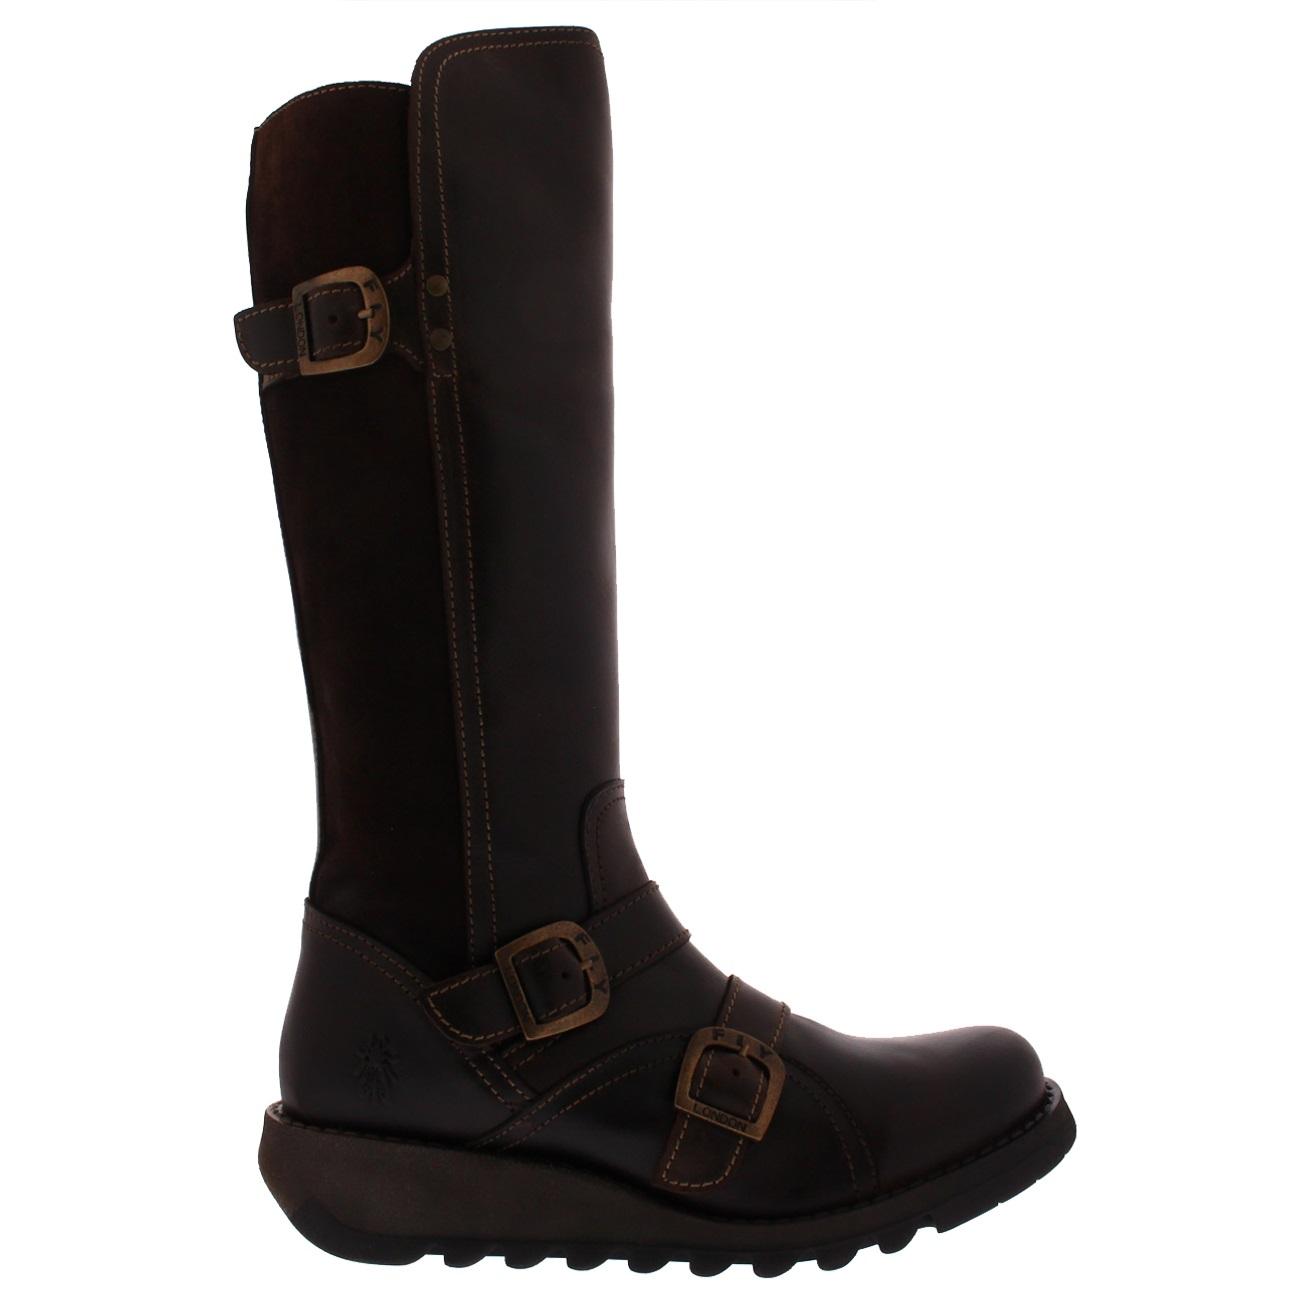 Womens-Fly-London-Suda-Leather-Winter-Work-Wedge-Heel-Knee-High-Boots-UK-3-10 thumbnail 17